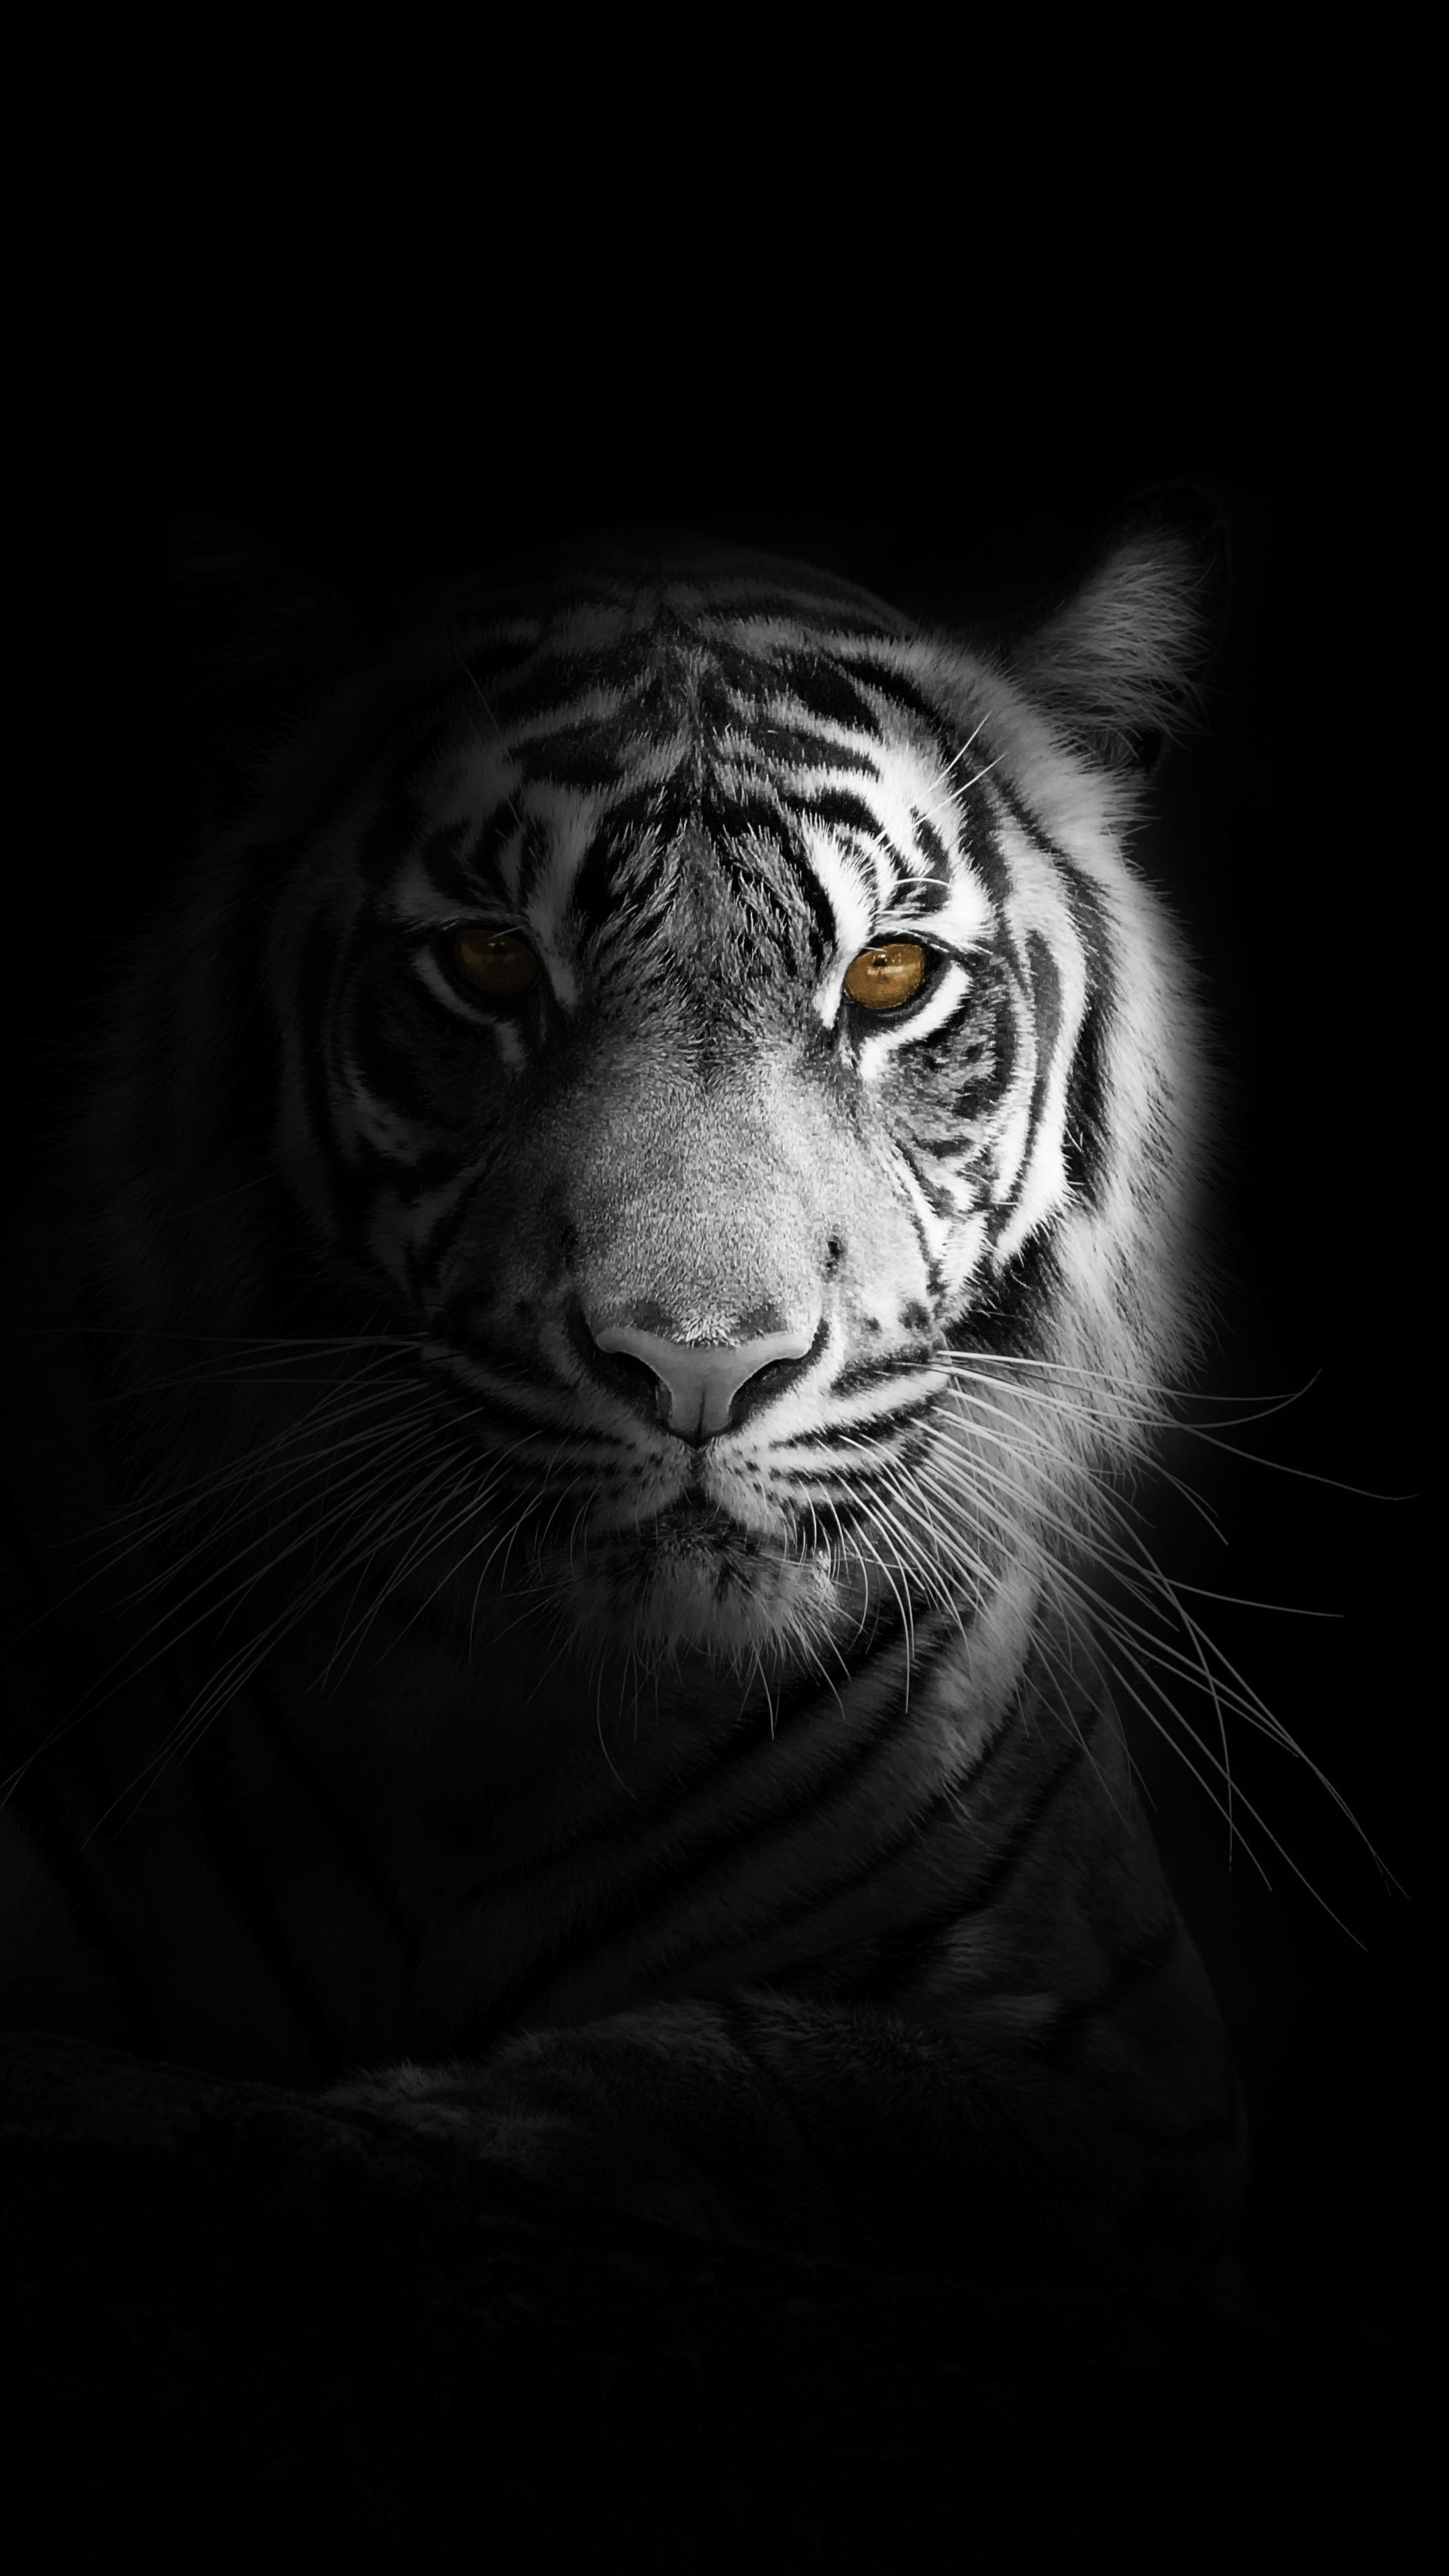 big-cat-tiger-4k-dc.jpg